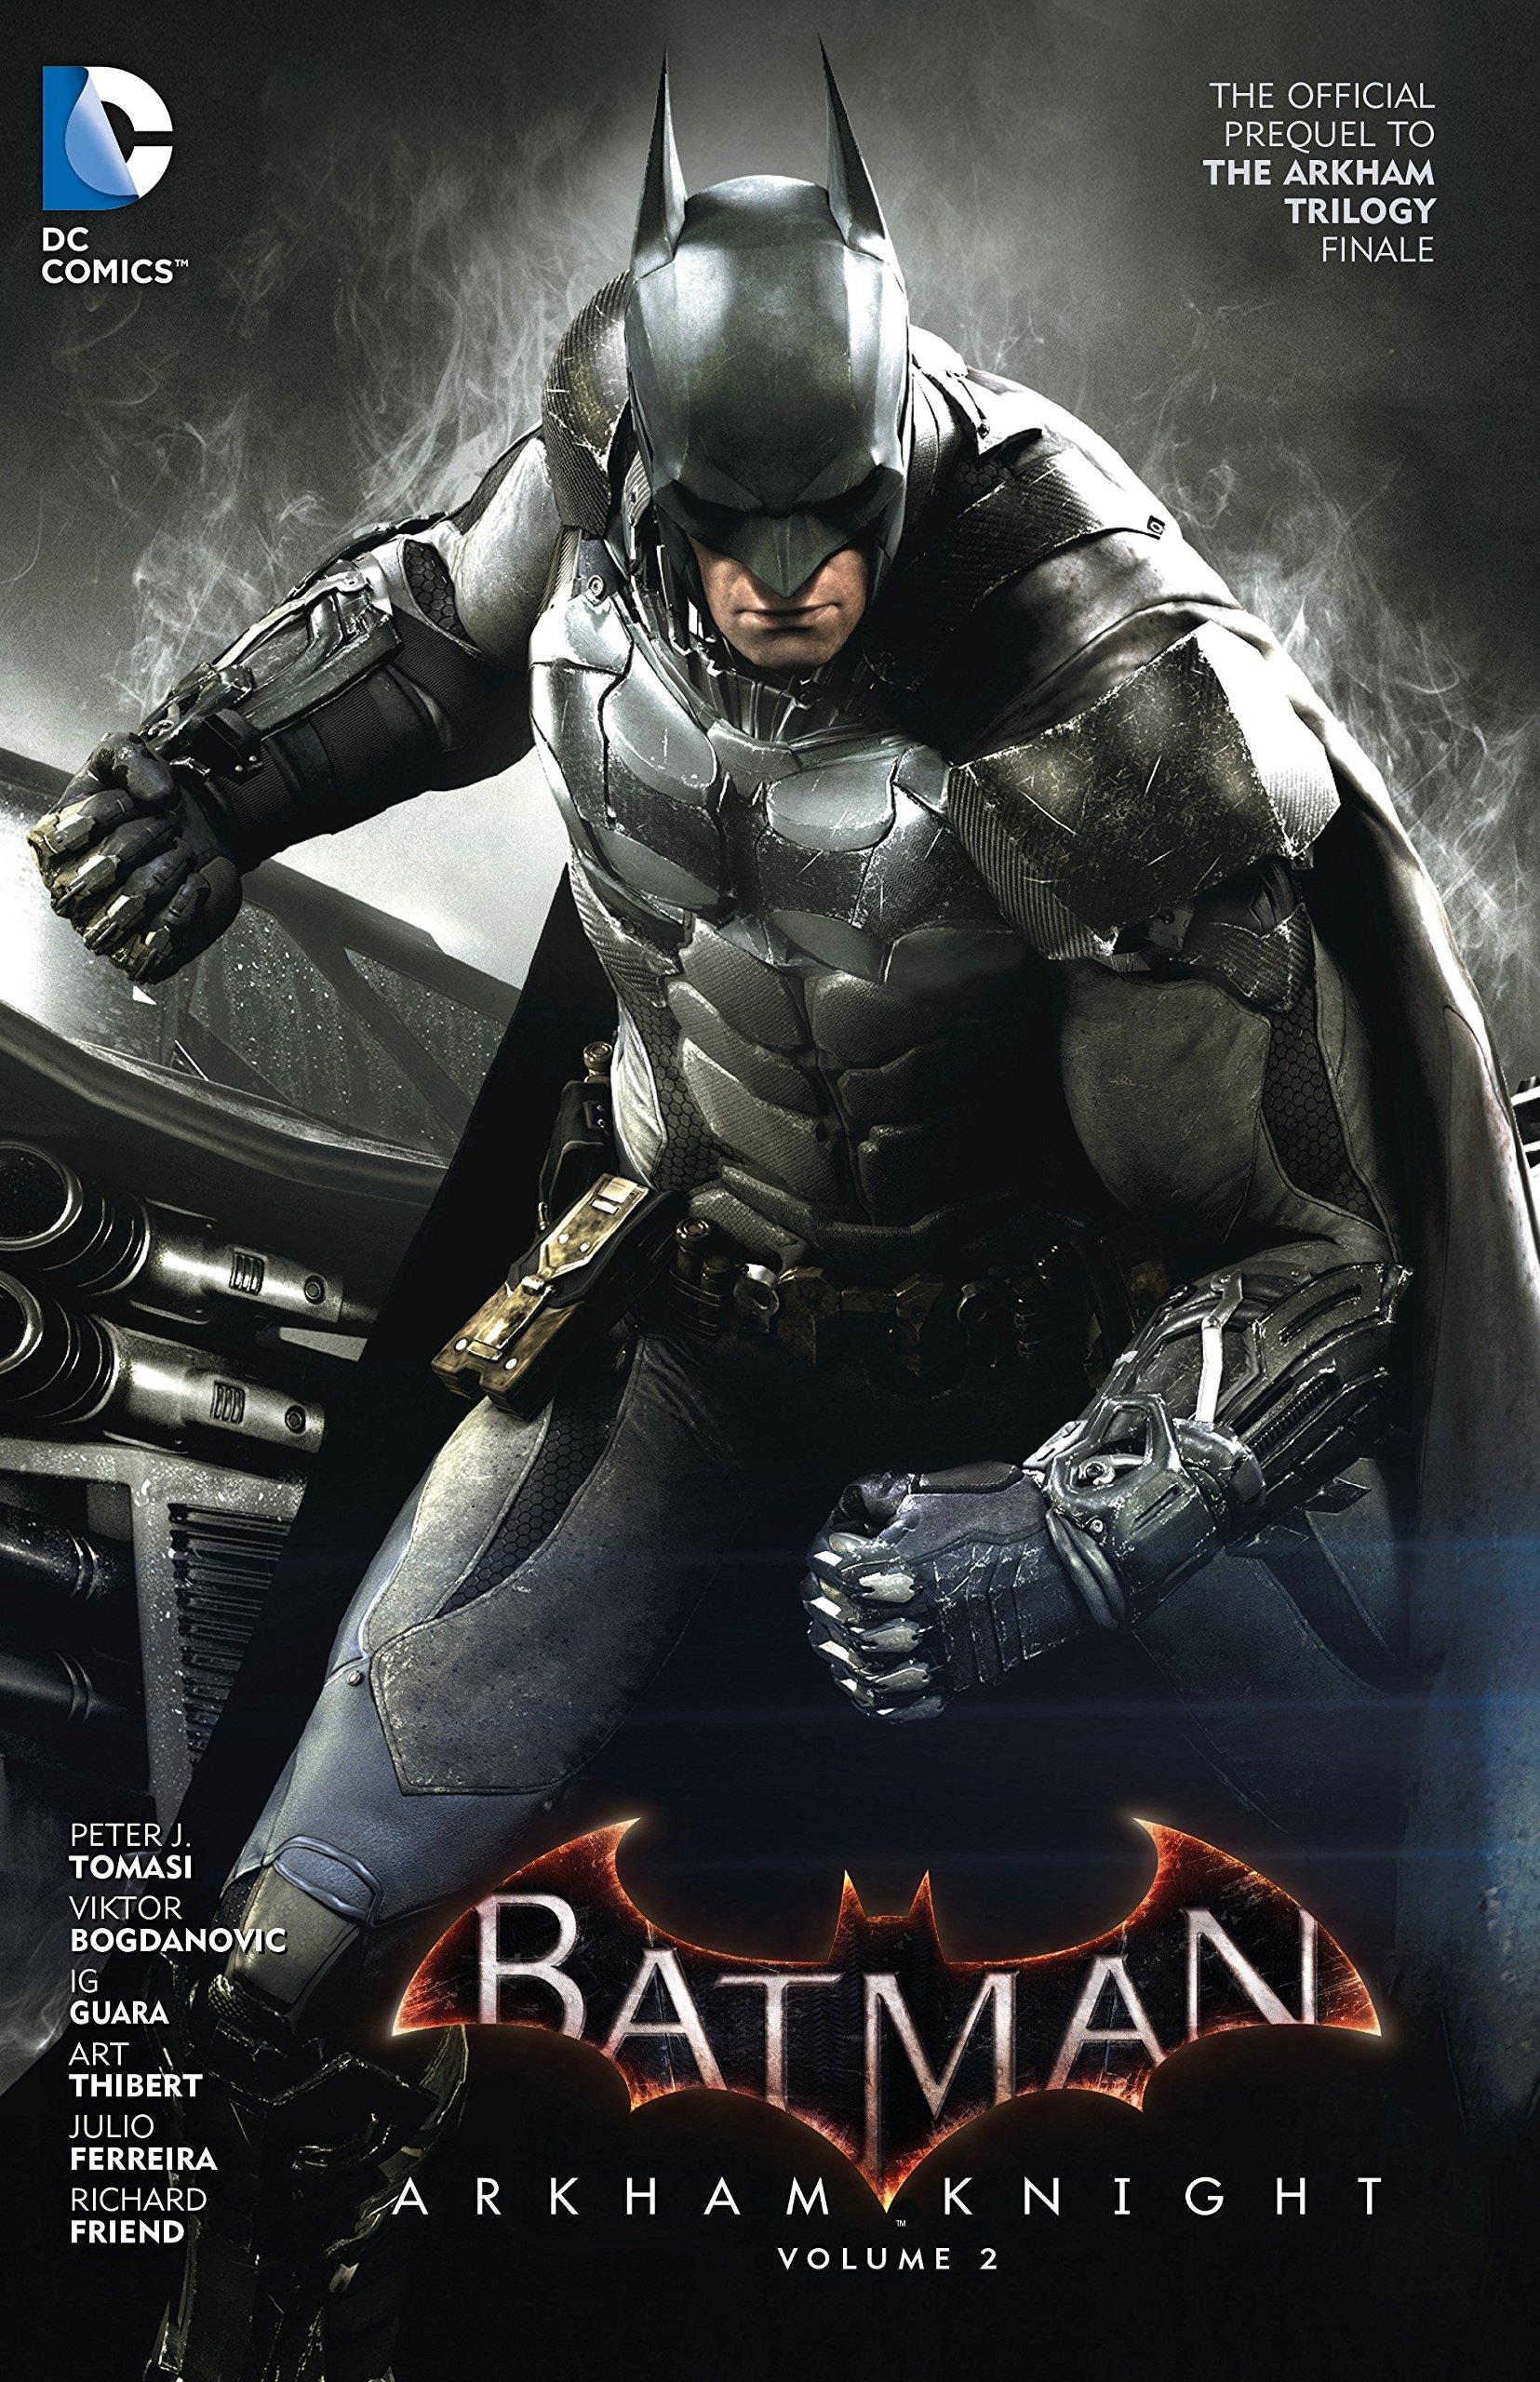 Batman: Arkham Knight Vol. 2: The Official Prequel to the Arkham Trilogy  Finale: Peter J. Tomasi, Viktor Bogdanovic: 9781401263409: Amazon.com: Books